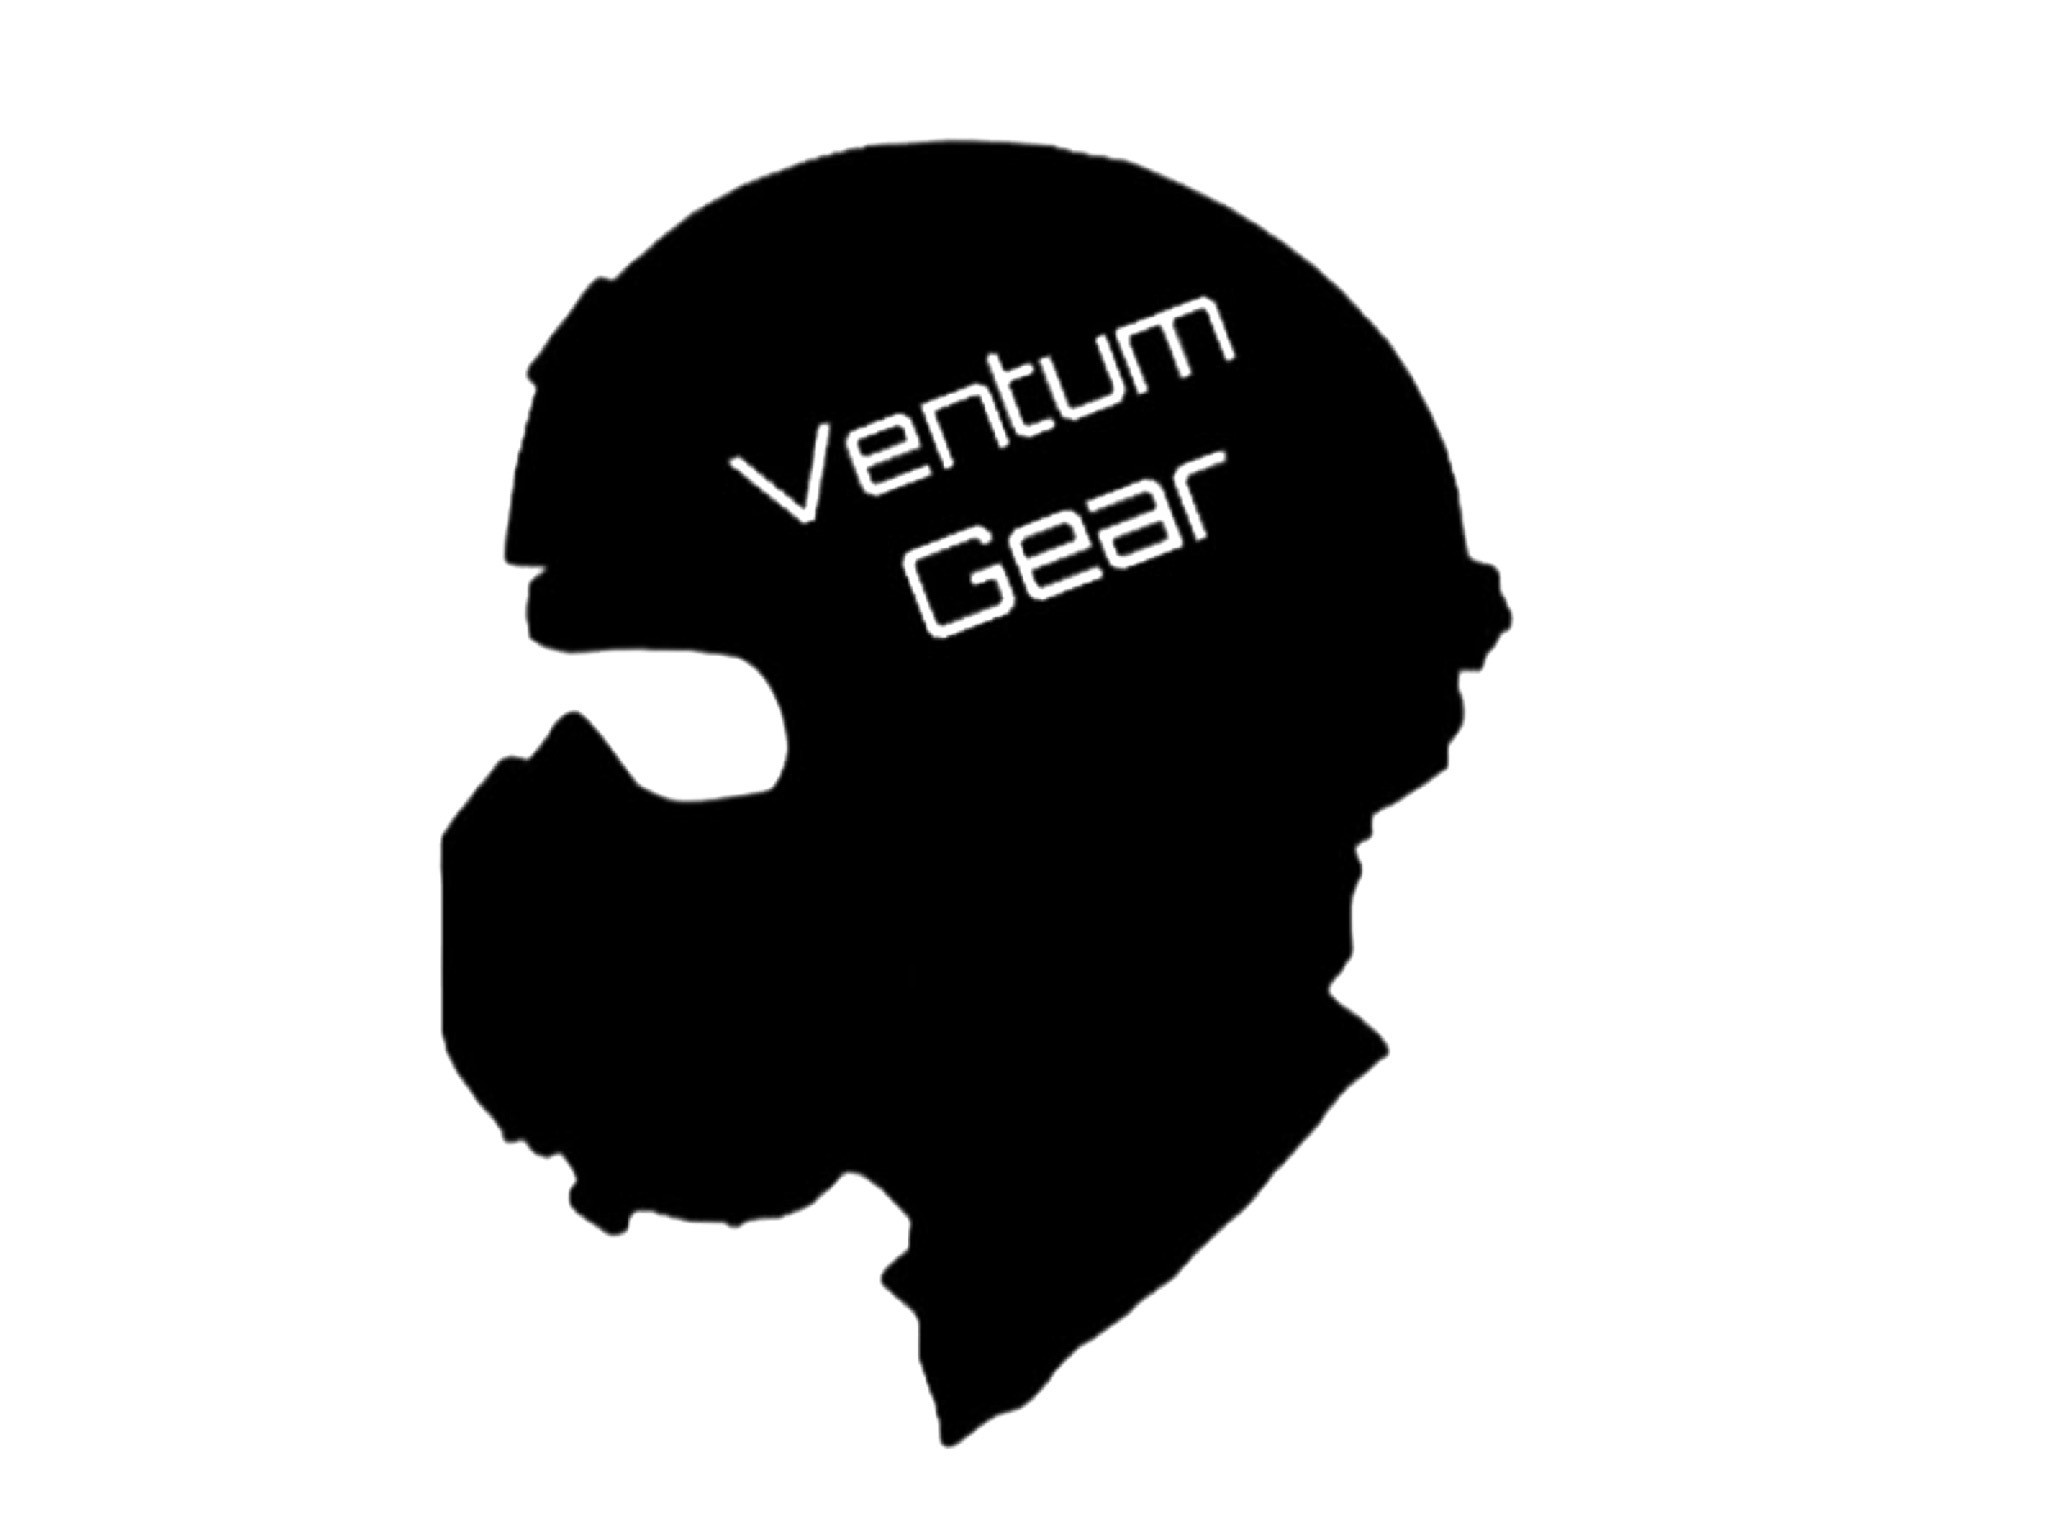 Ventum Gear